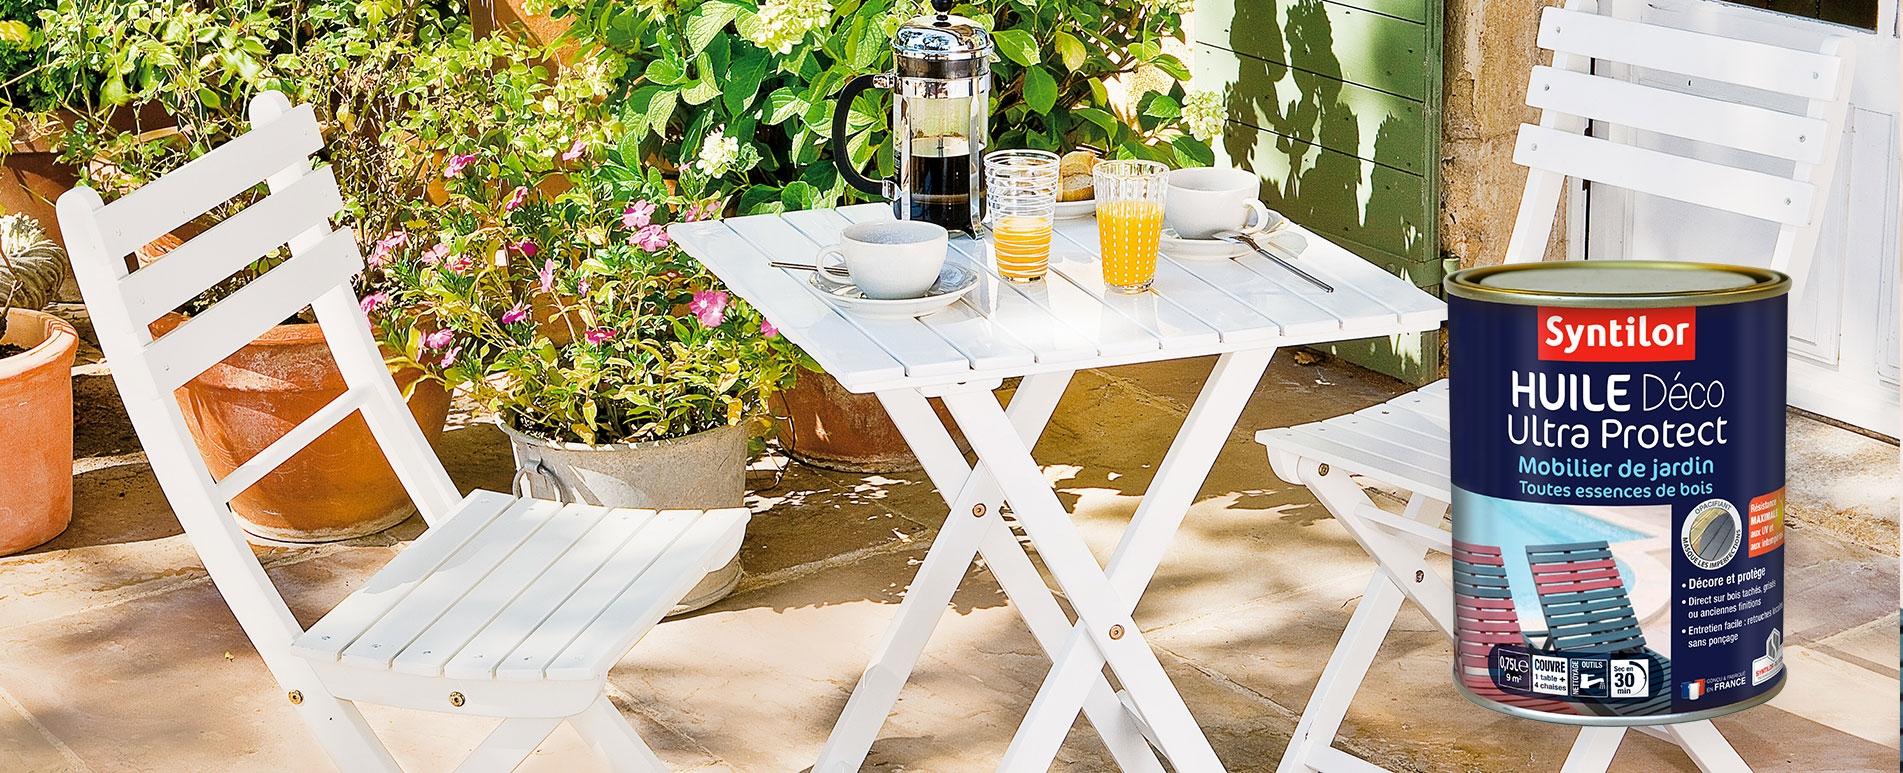 Huile Déco Ultra Protect meuble de jardin